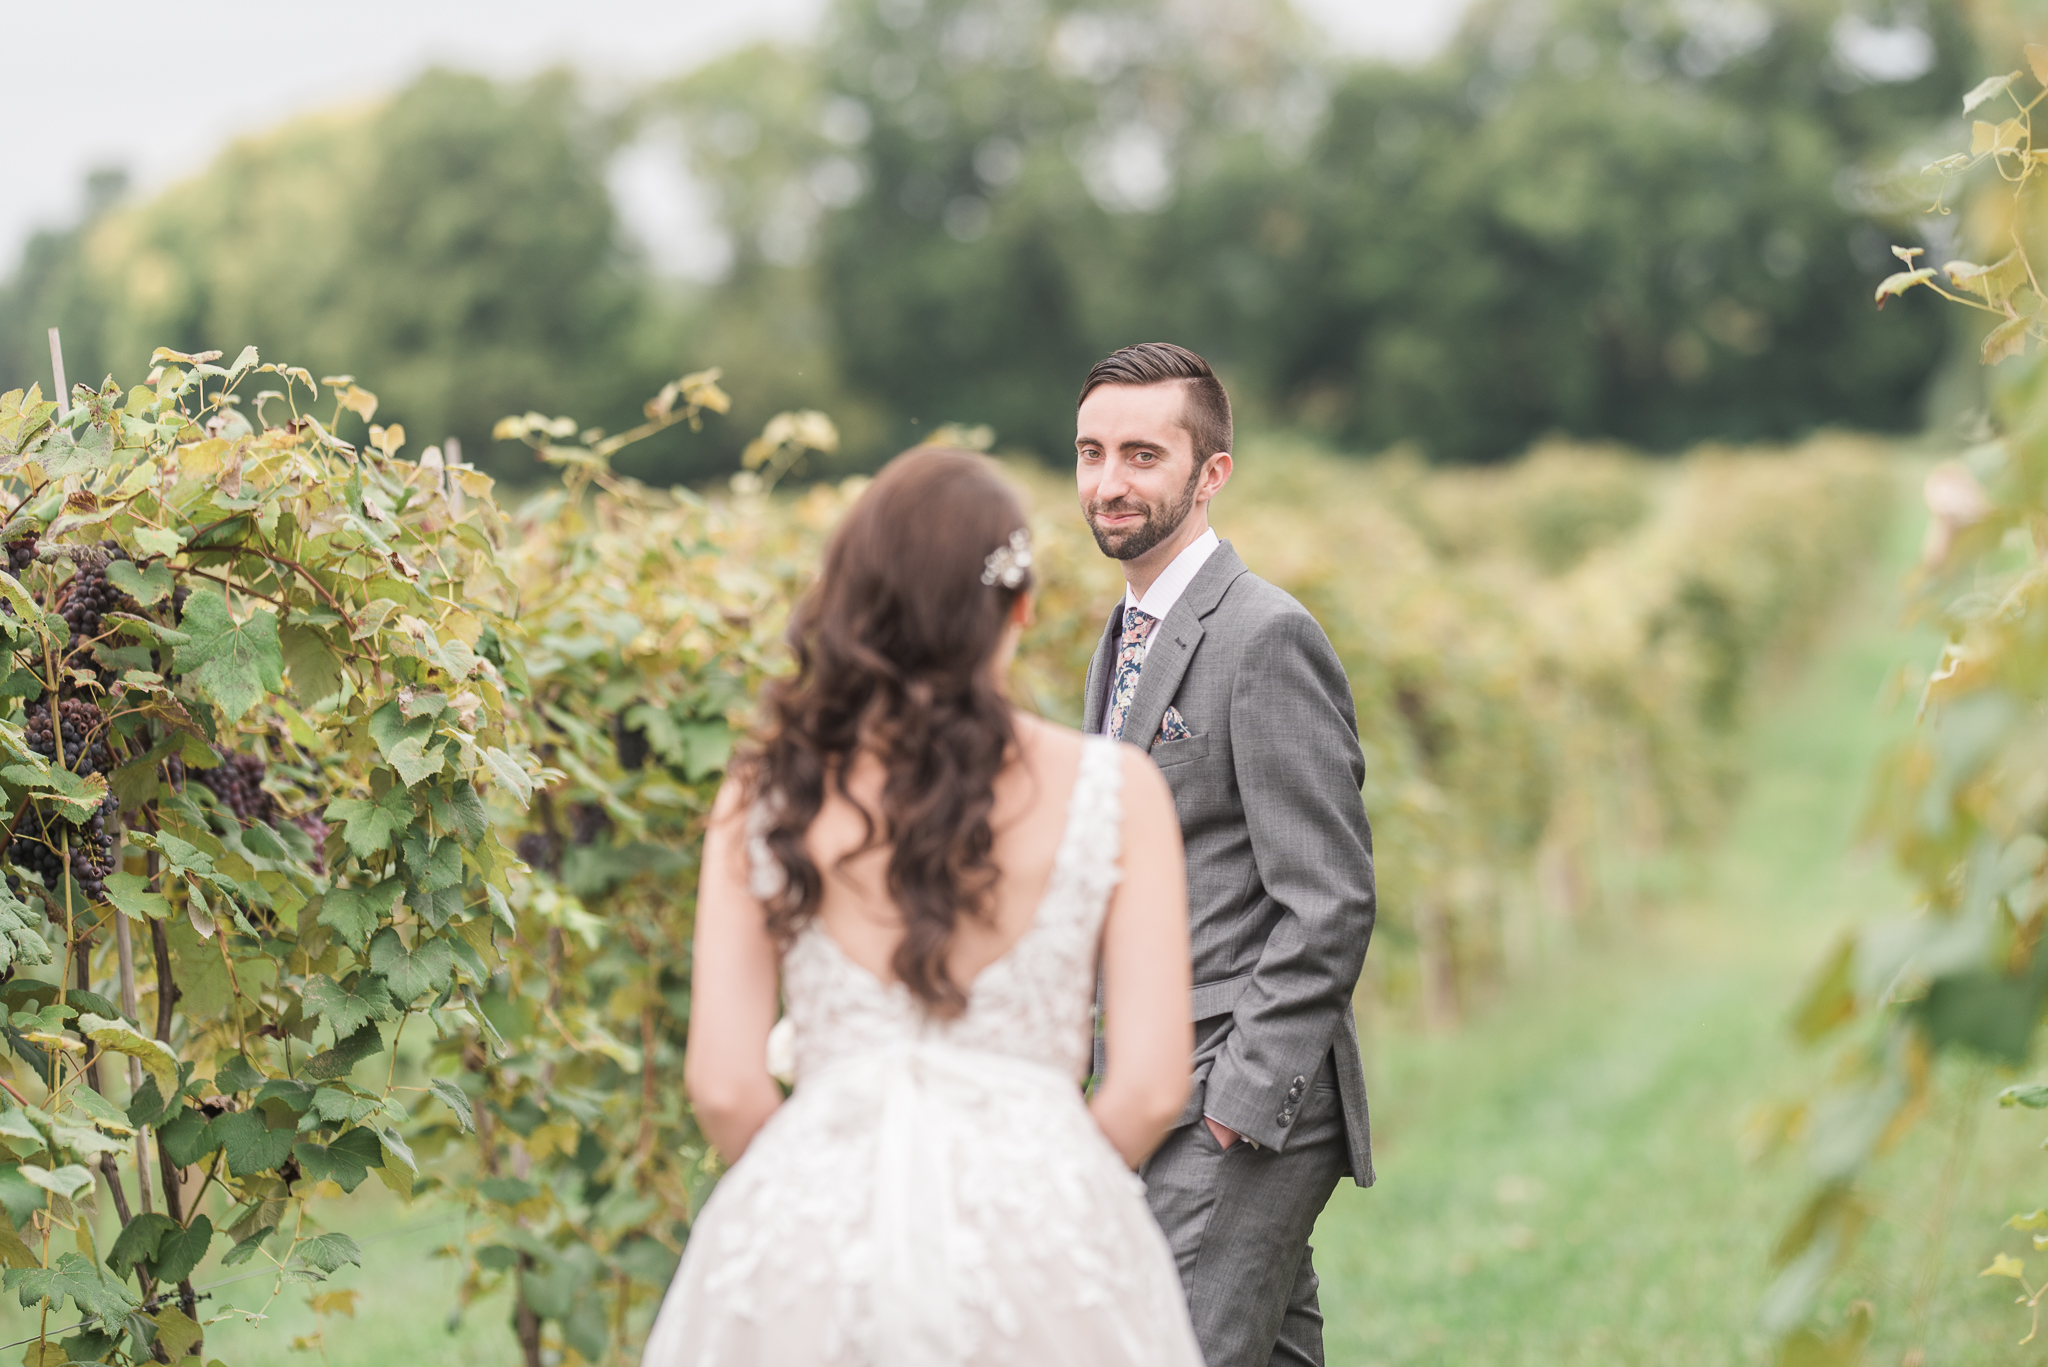 Sycamore at Mallow Run Wedding6656.jpg